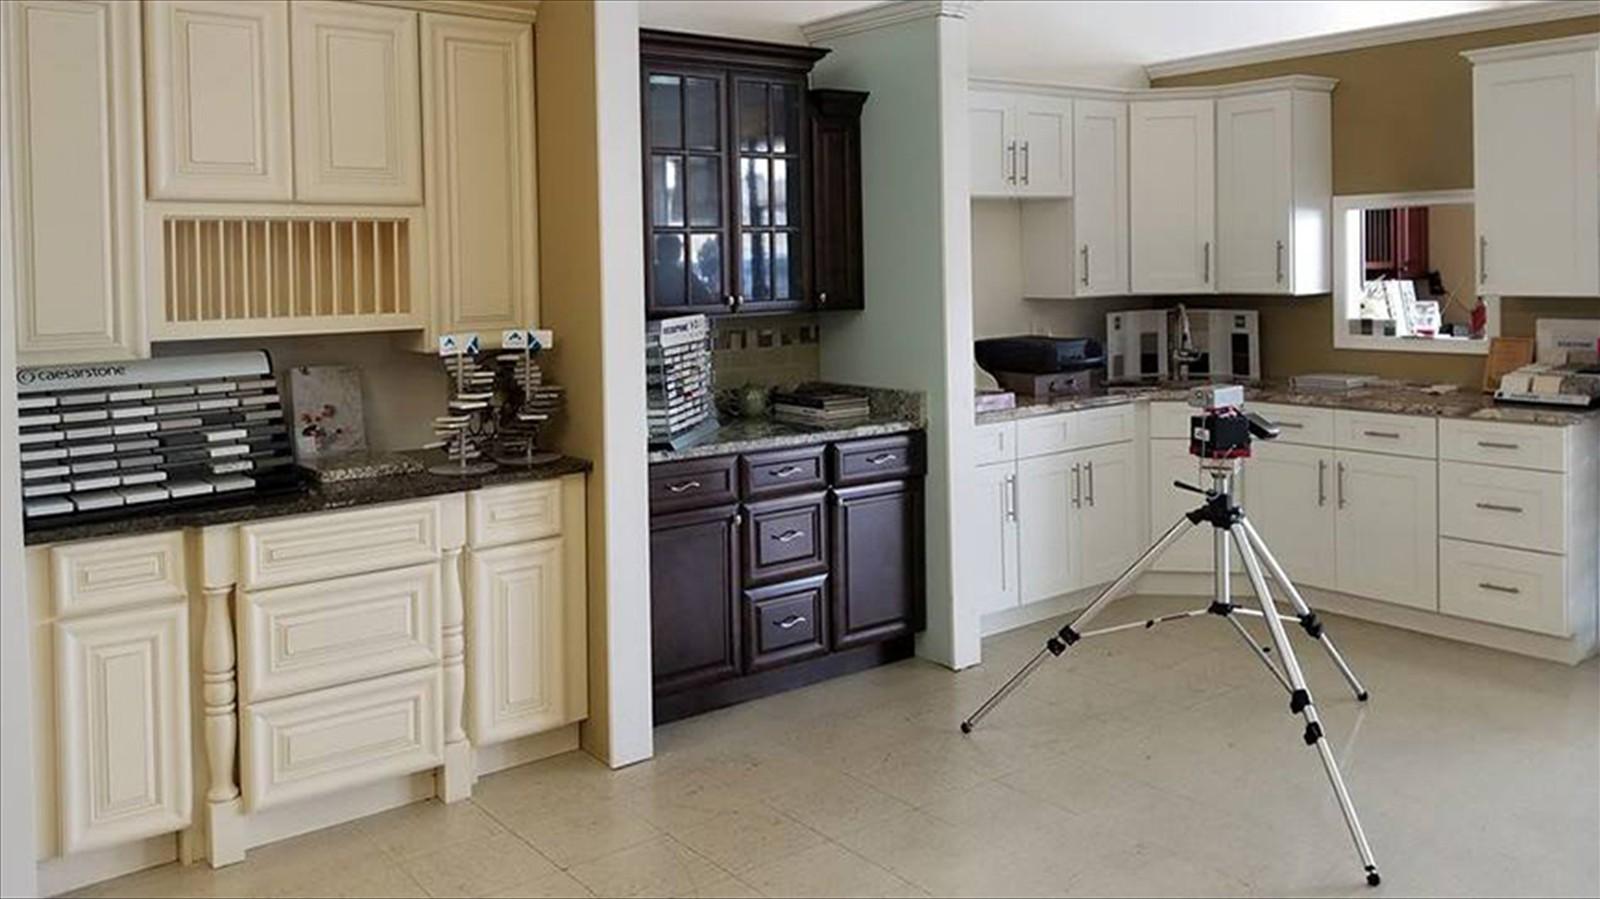 Awesome Elite Countertops Fredericksburg Virginia Kitchen Remodeling Home Interior And Landscaping Oversignezvosmurscom